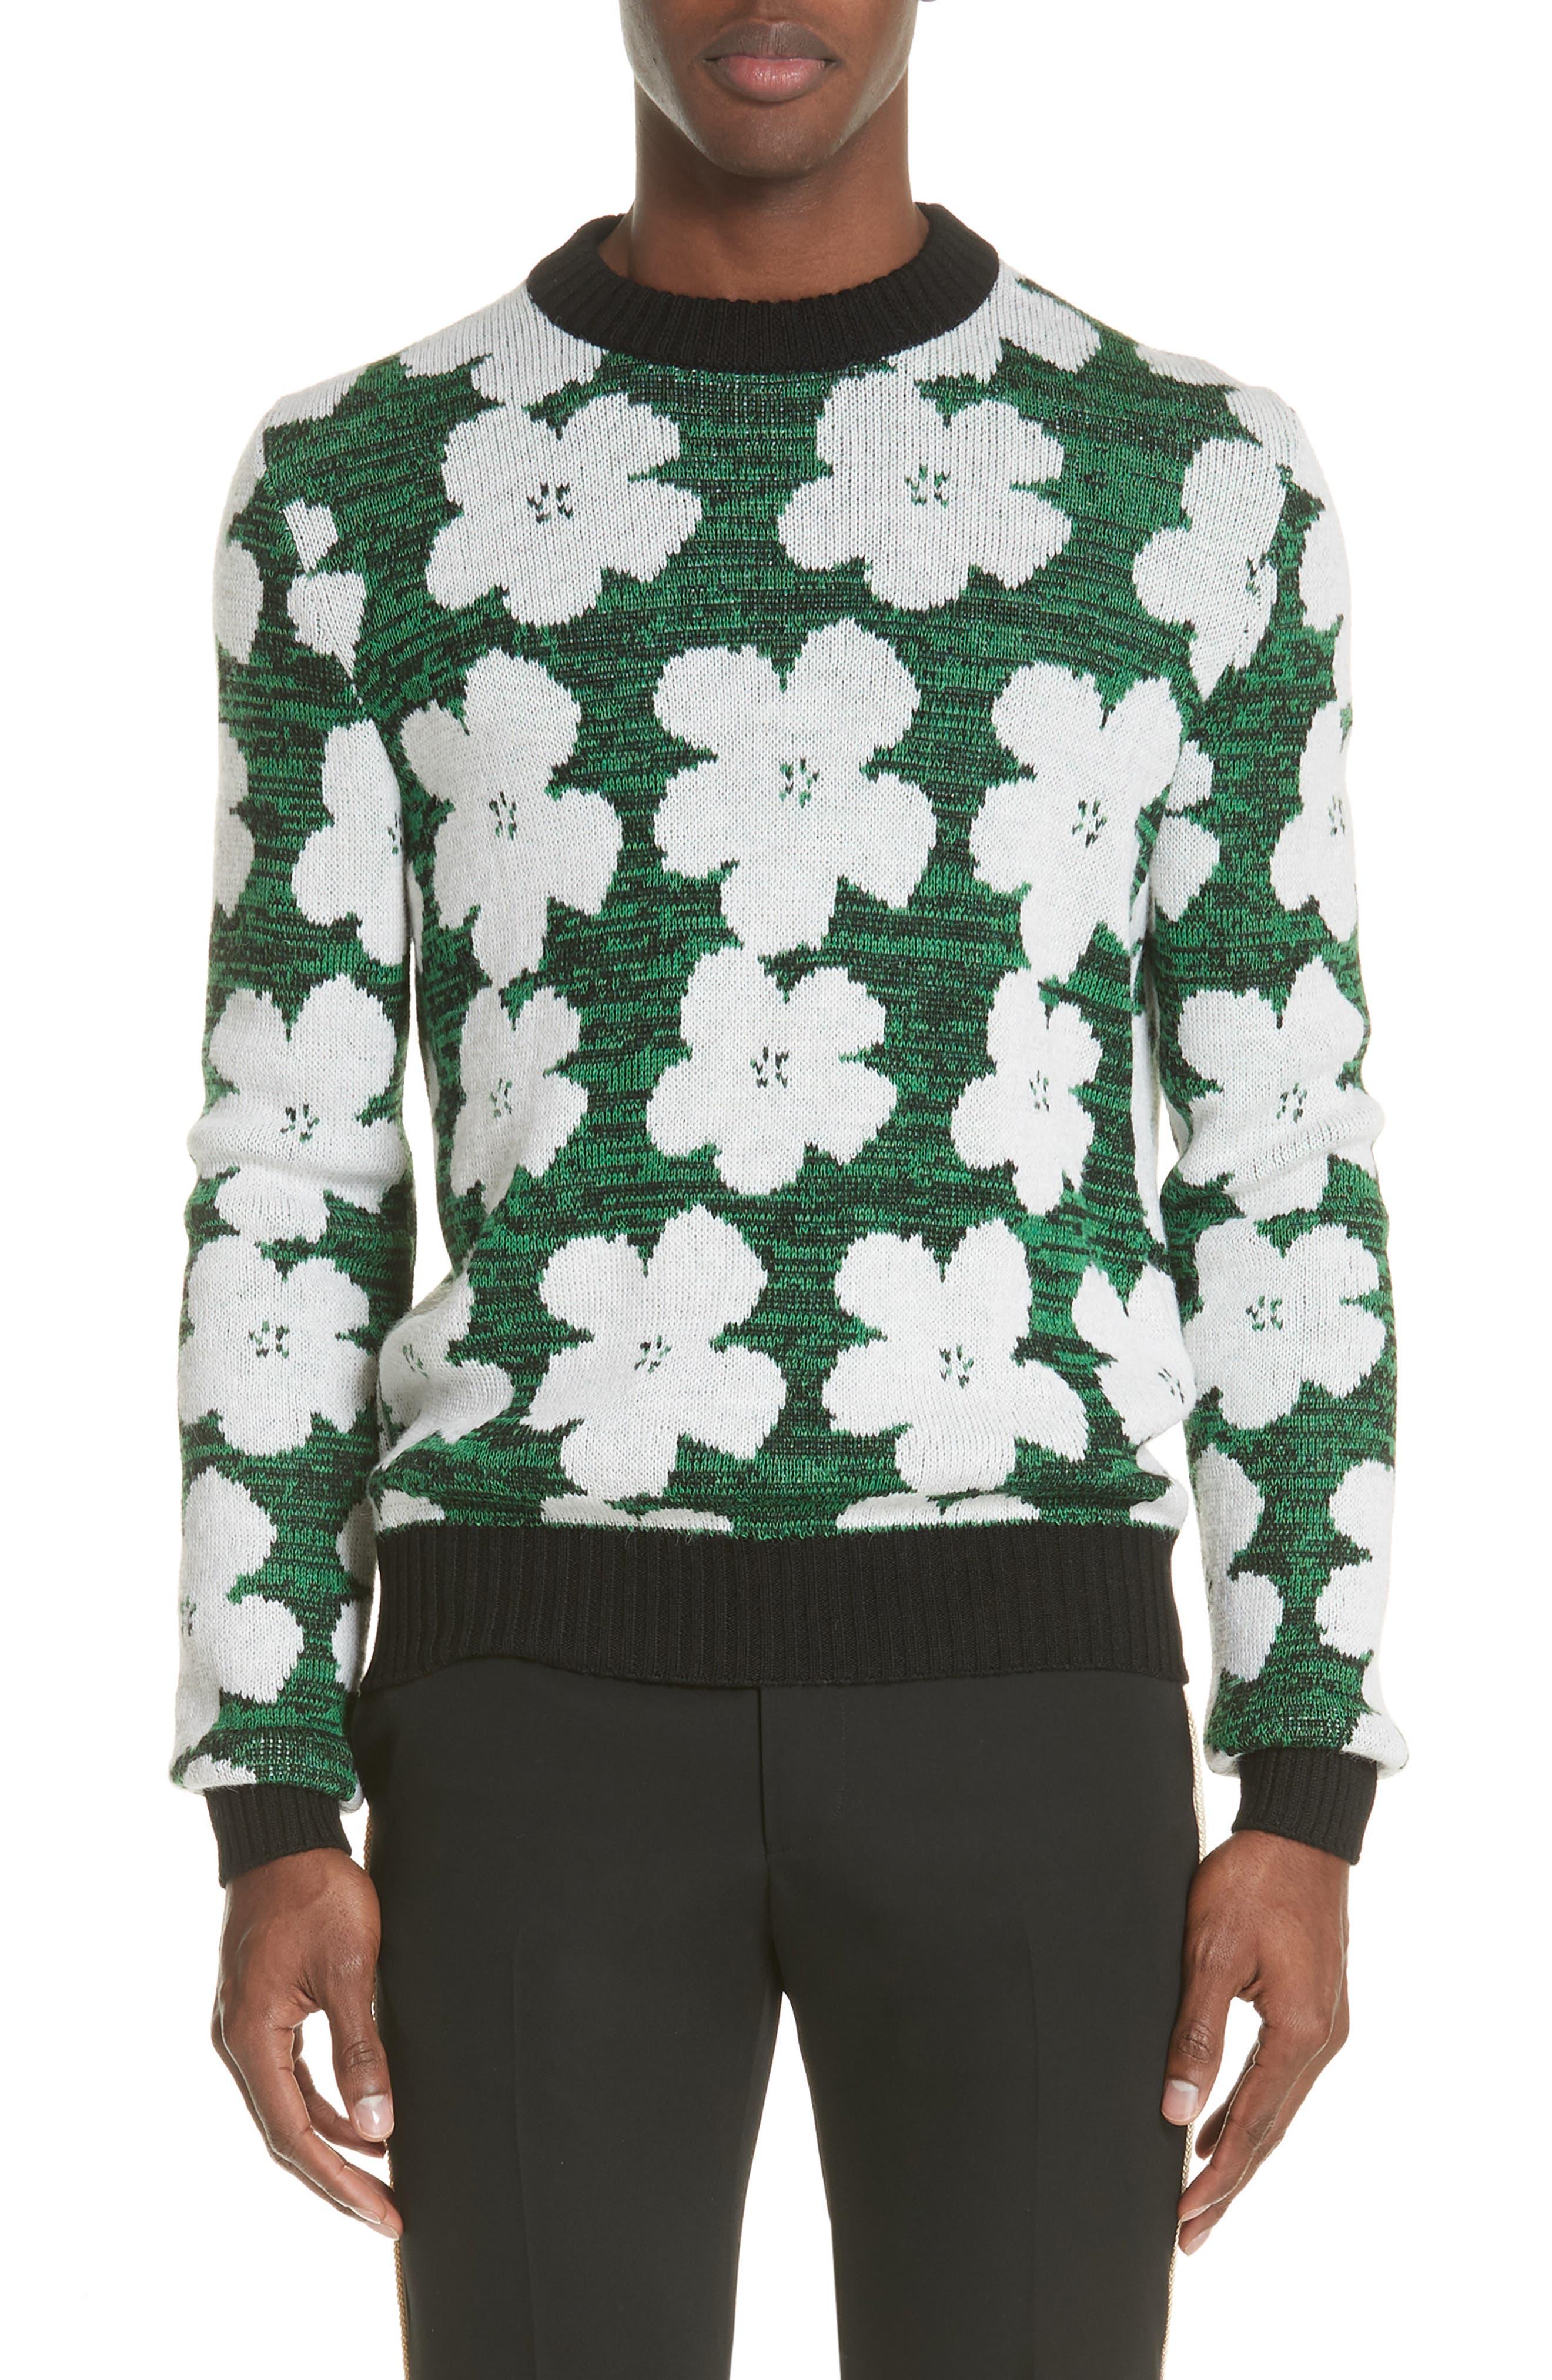 Andy Warhol Flower Sweater